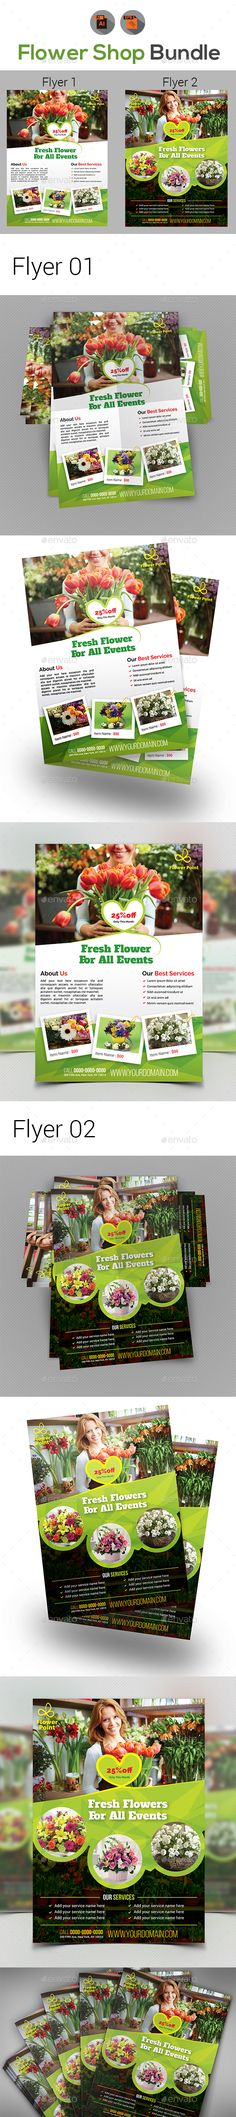 Flower Shop Flyer Bundle — Vector EPS #floral #mike • Available here → https://graphicriver.net/item/flower-shop-flyer-bundle/19298231?ref=pxcr